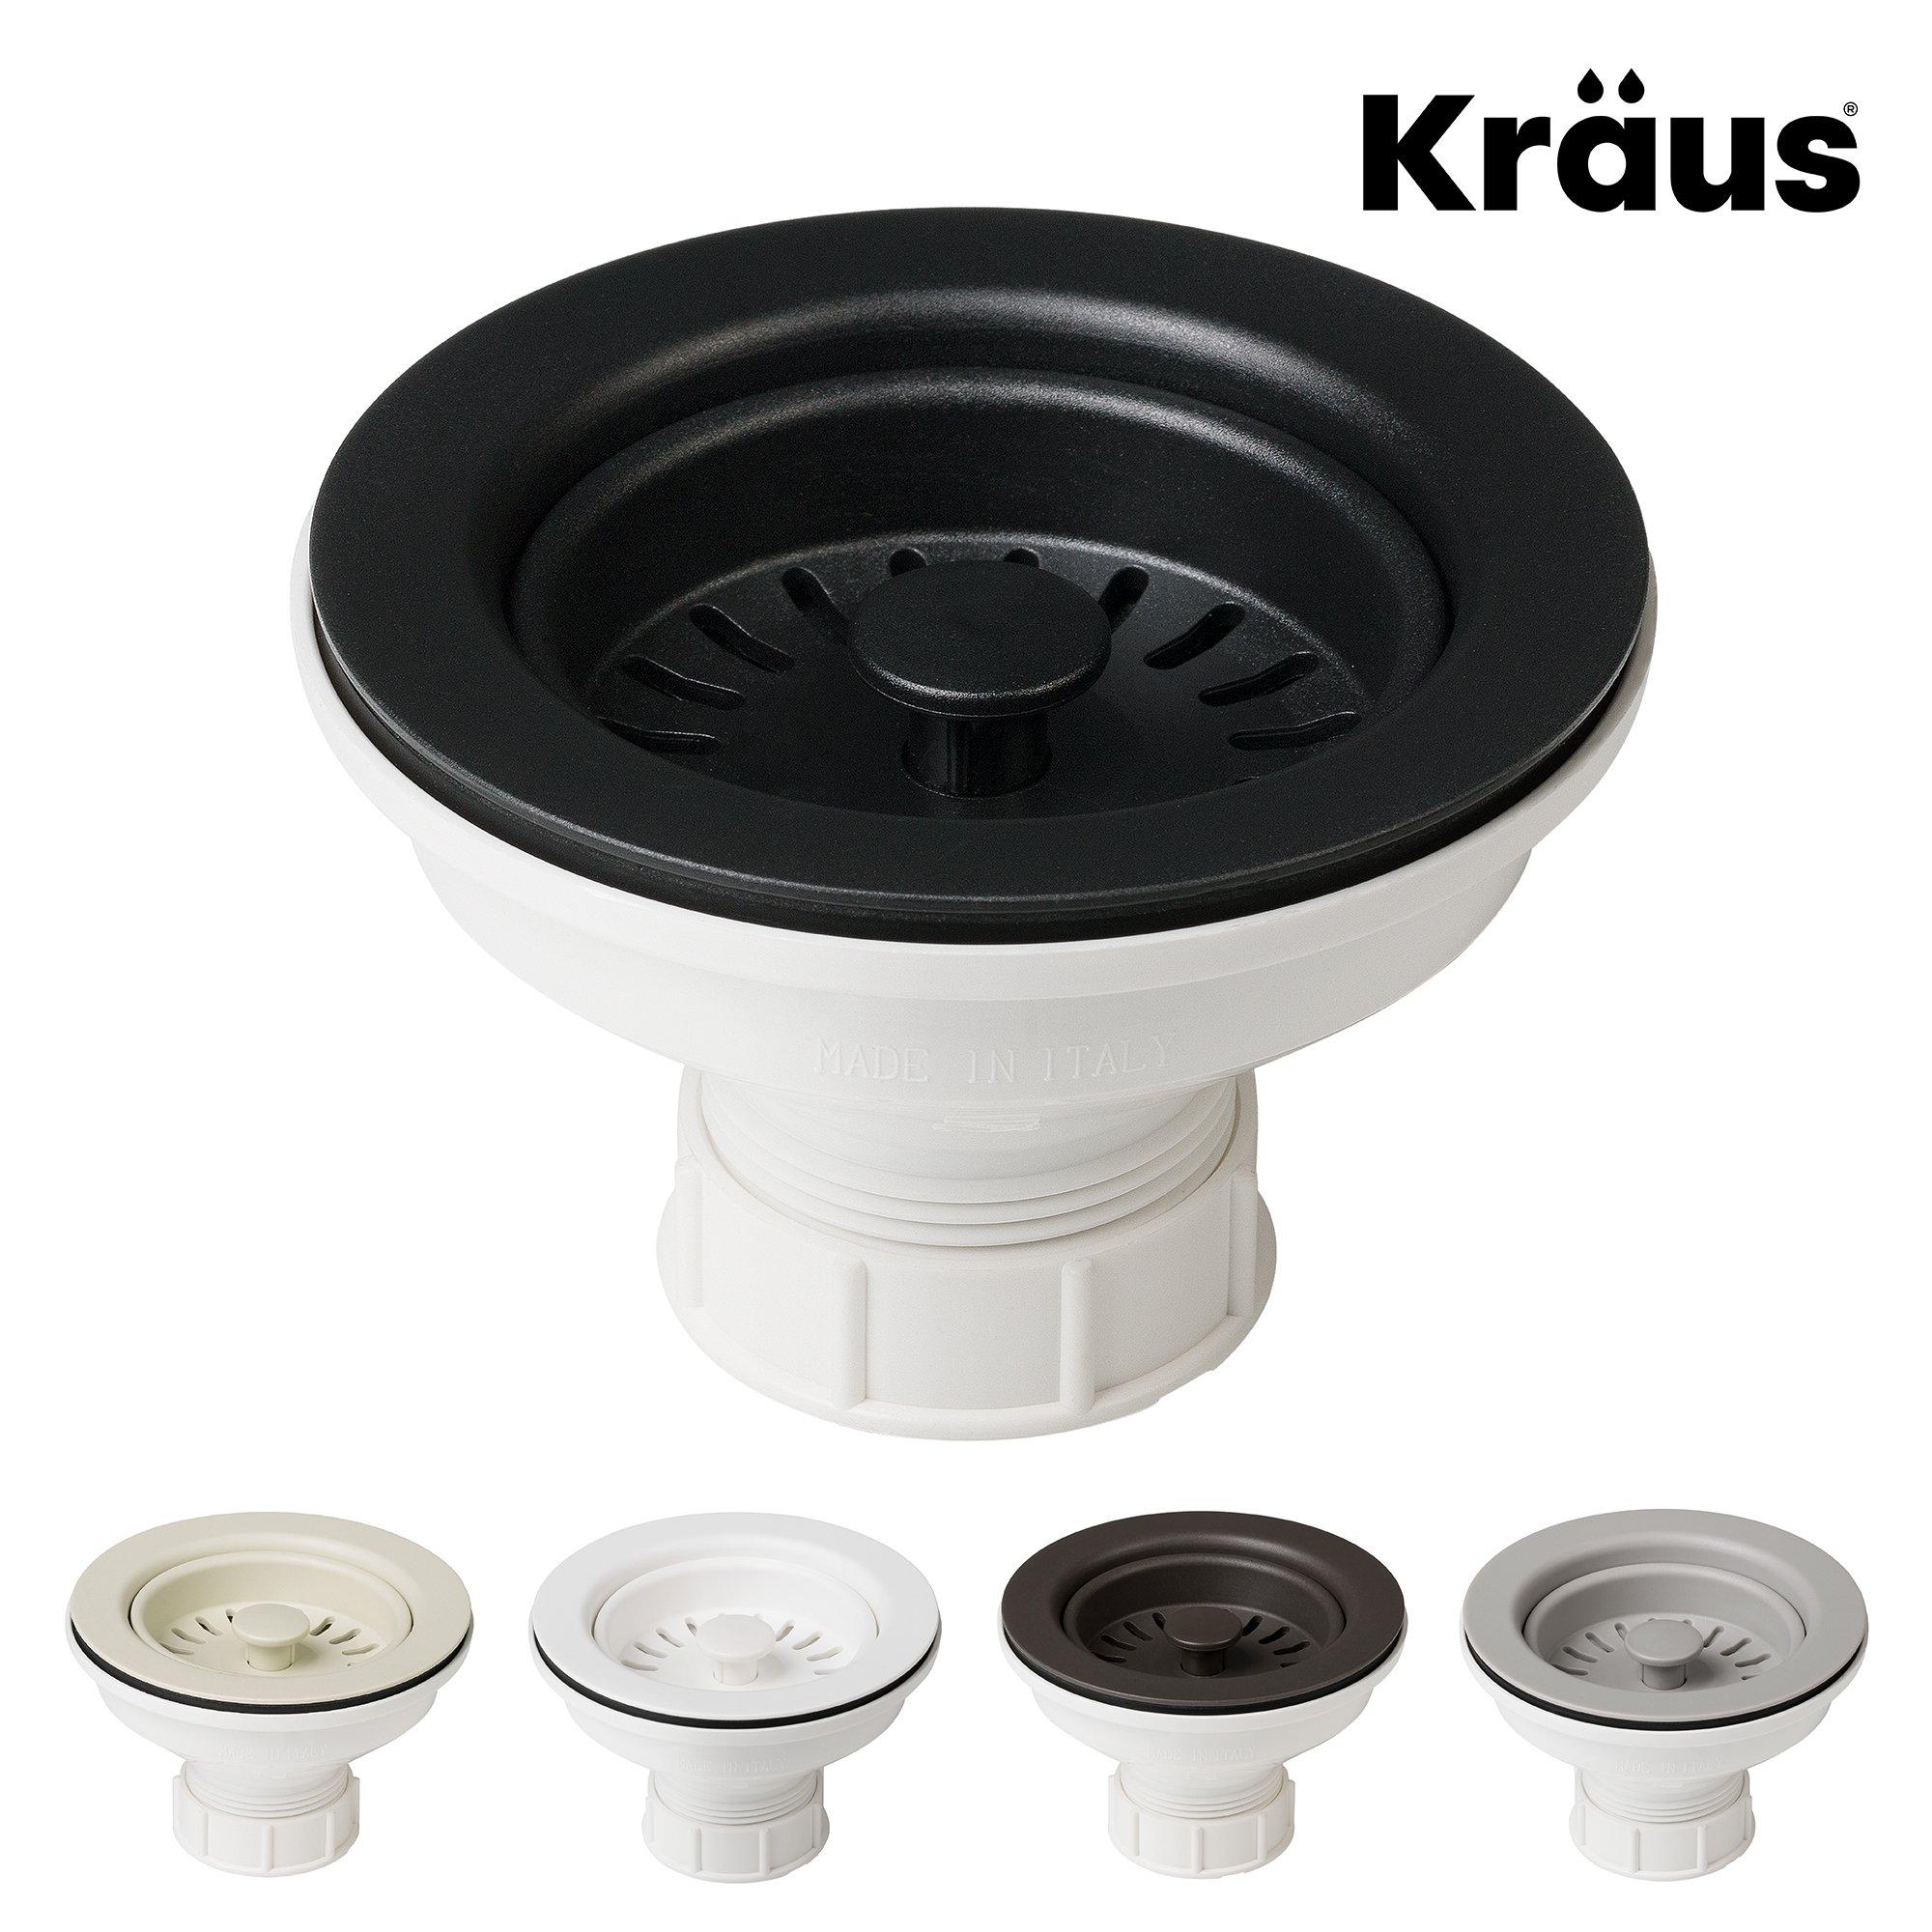 Kraus Kitchen Sink Strainer for 3.5-Inch Drain Openings in Black